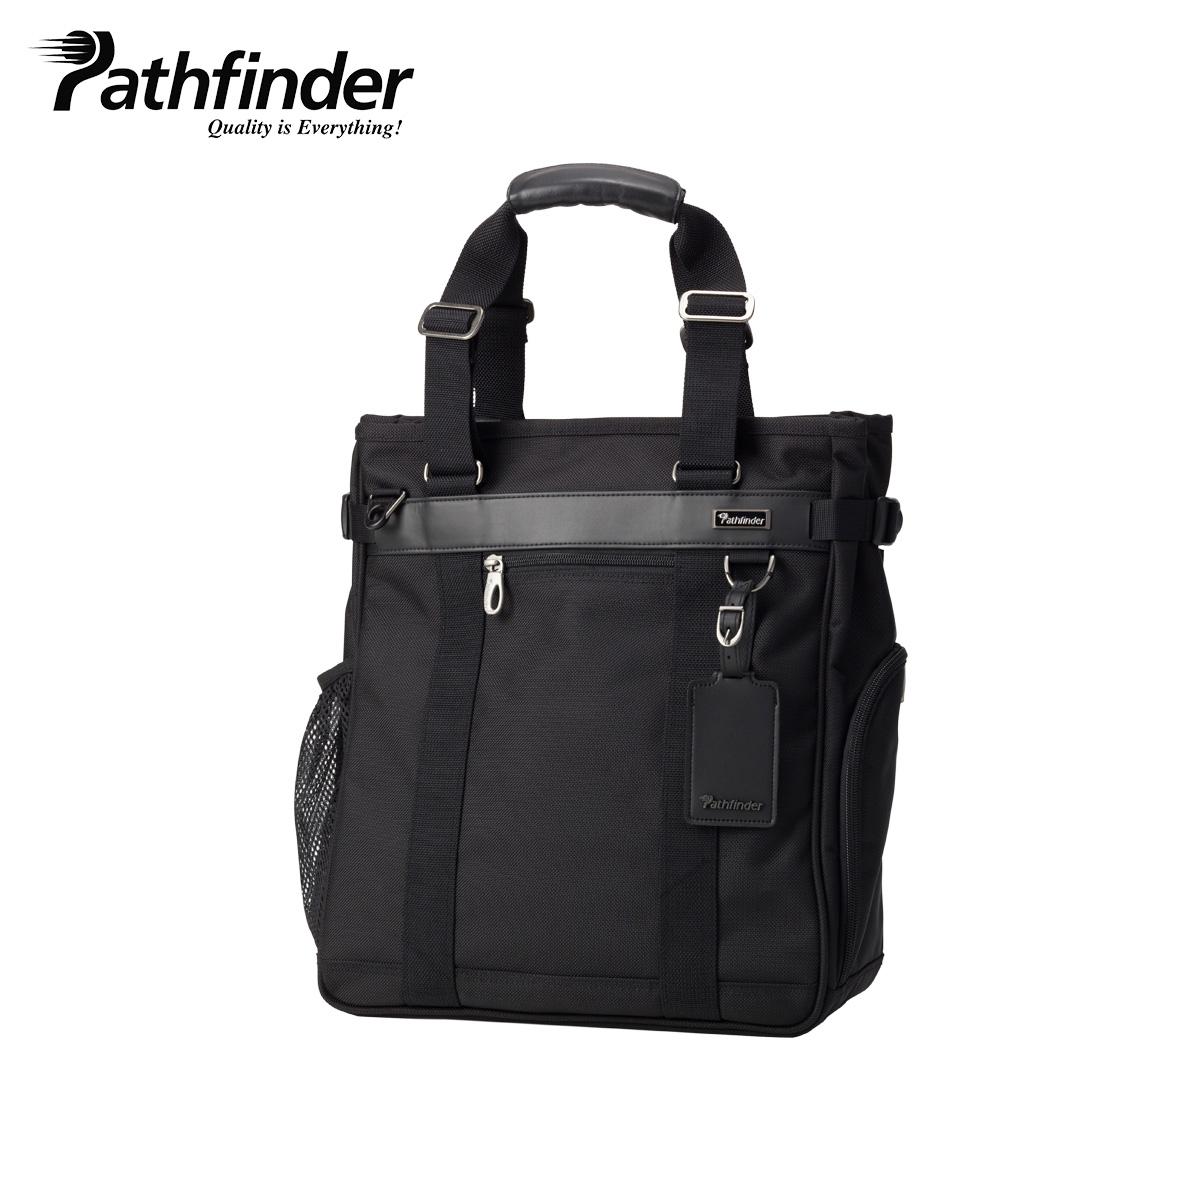 Pathfinder REVOLUTION XT パスファインダー トート バッグ ビジネスバッグ ショルダー メンズ ブラック 黒 PF6808B